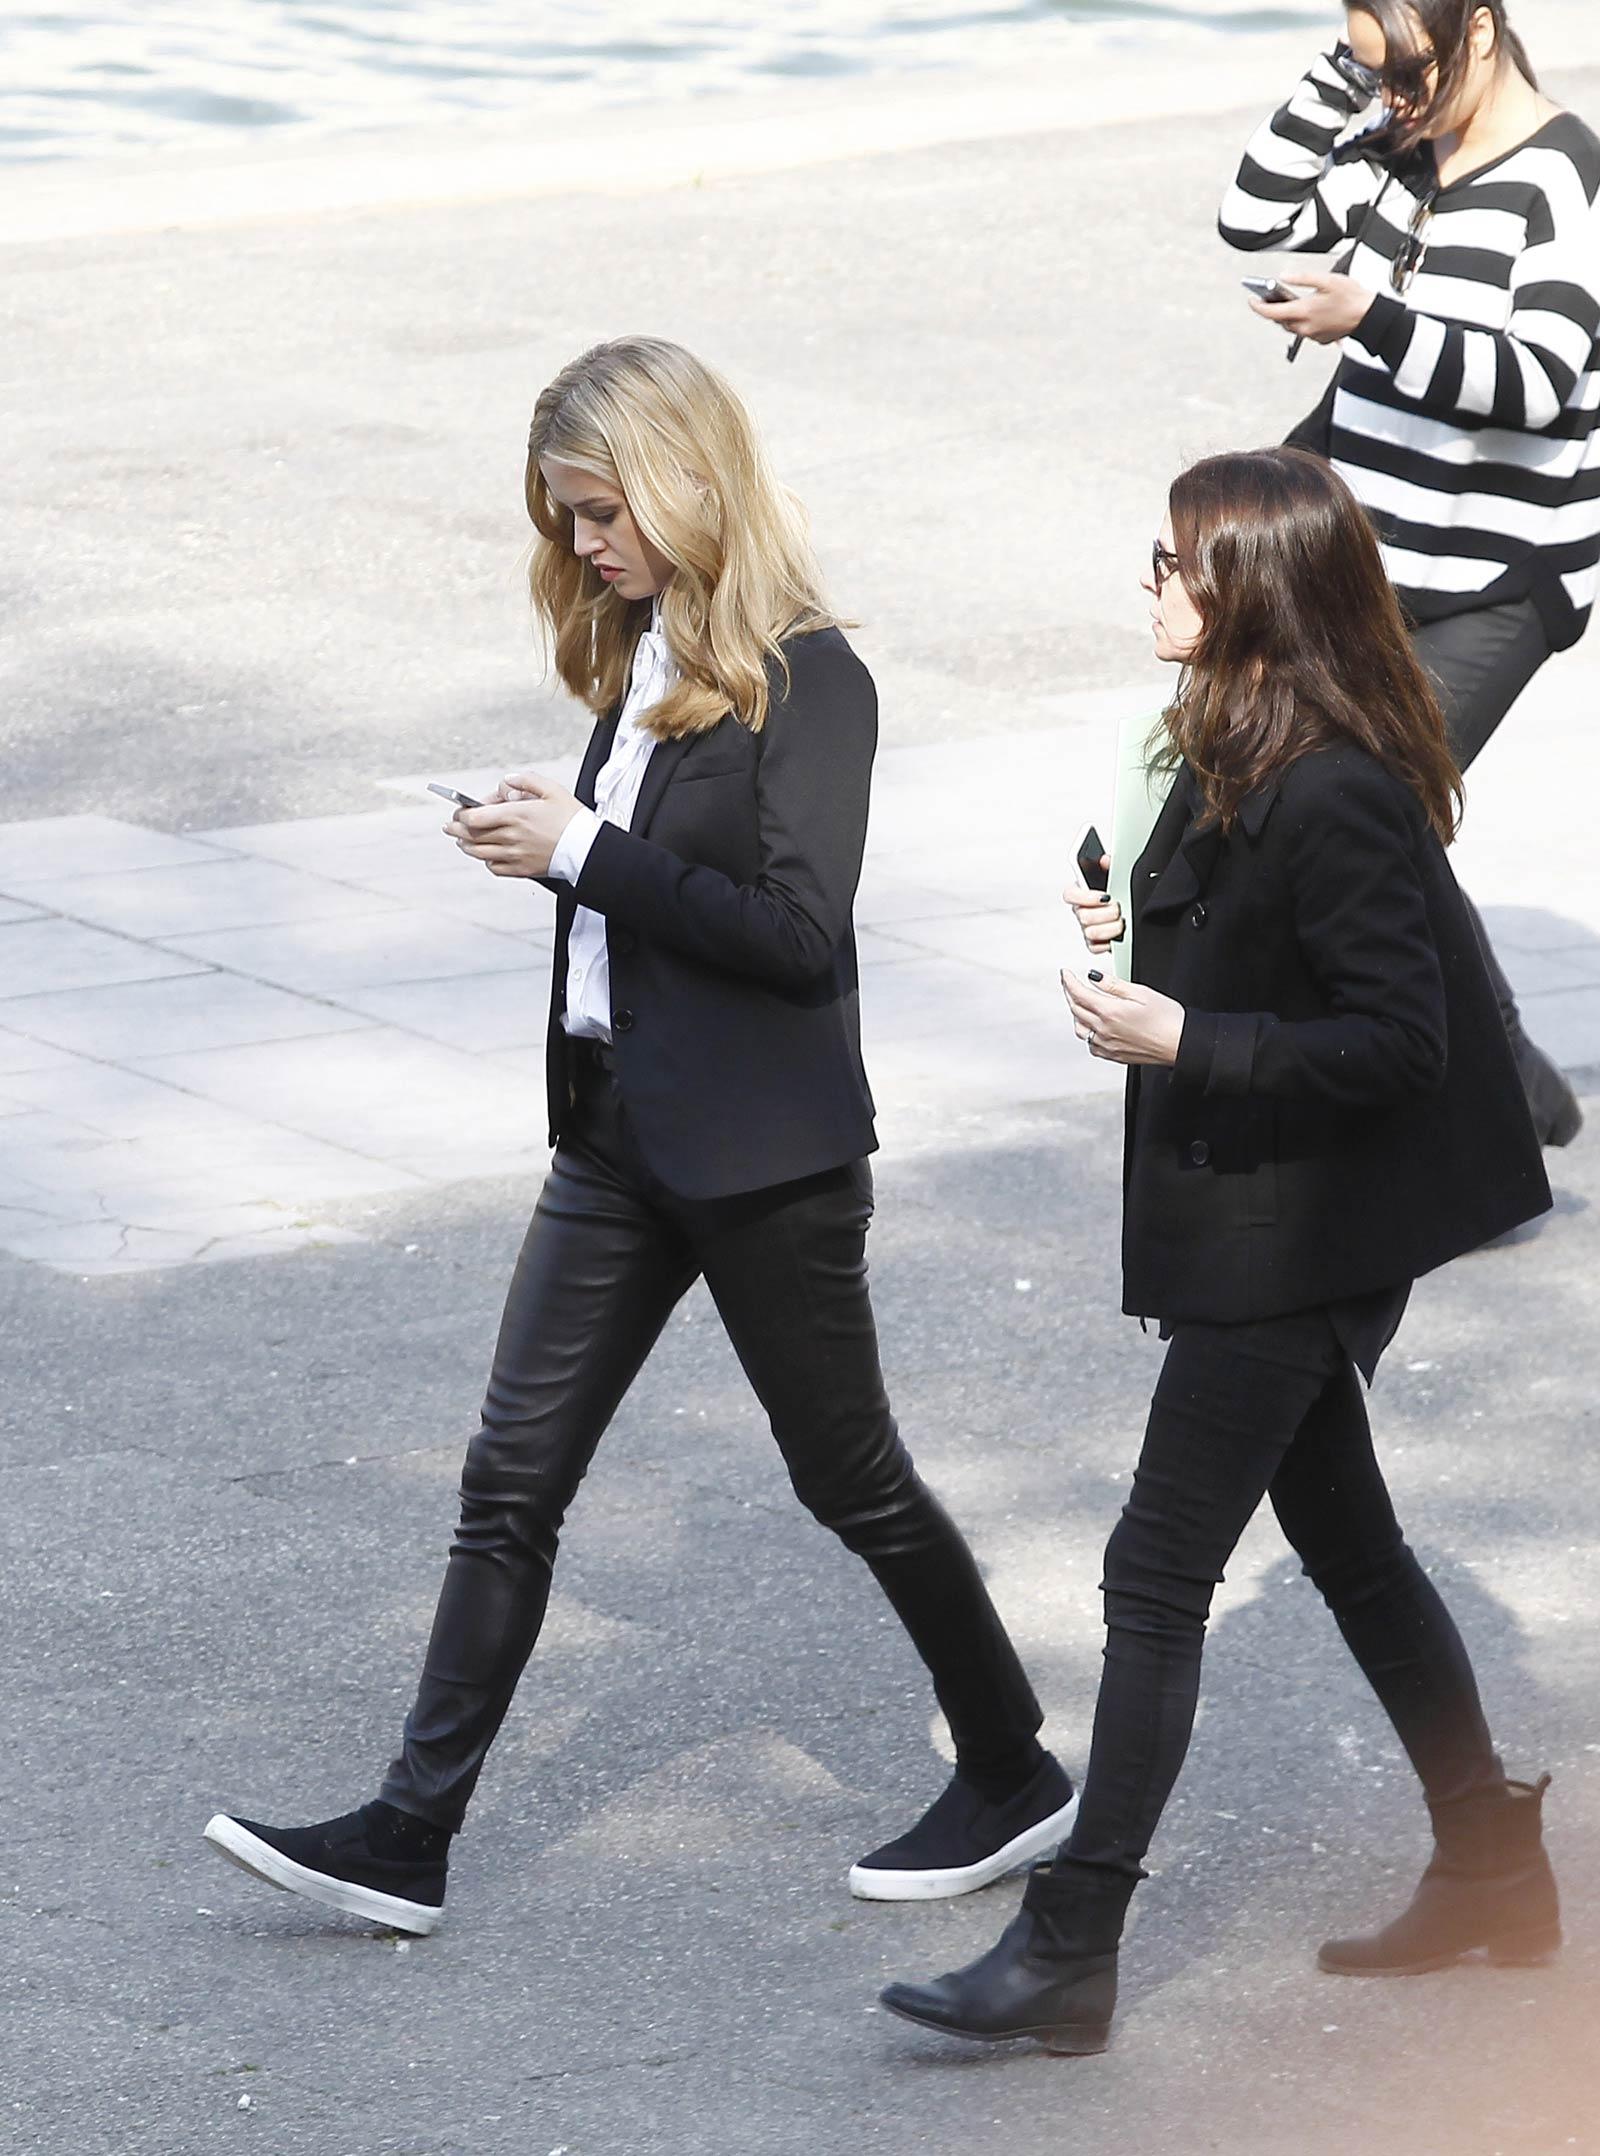 Georgia May Jagger filming an ad for Garnier